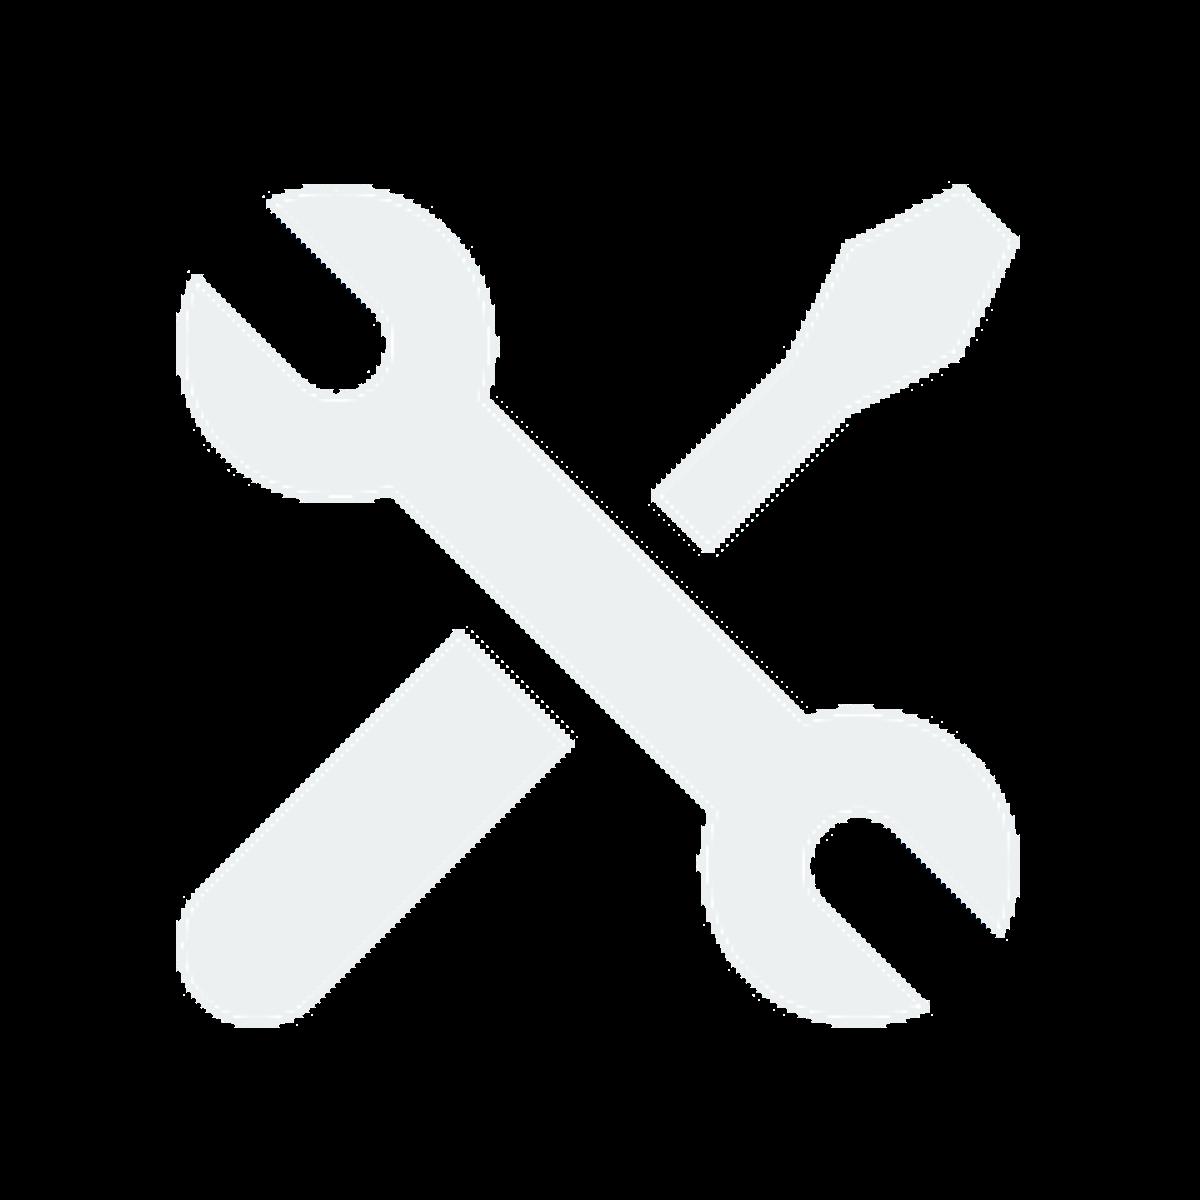 Tools & Resources - The Platform